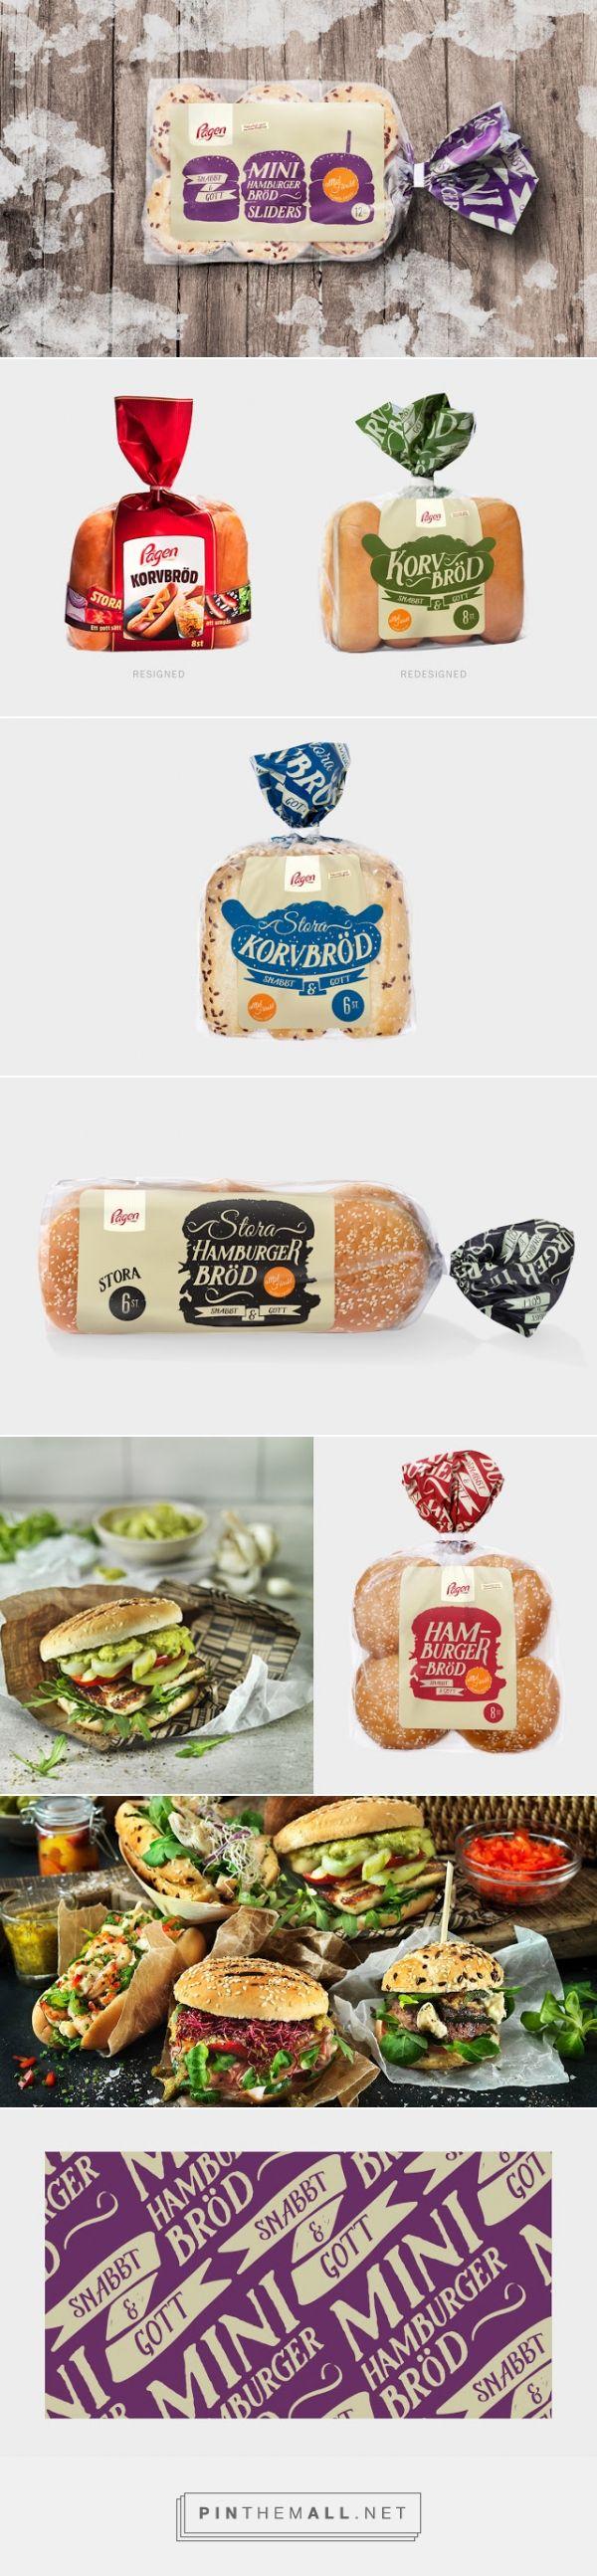 Pågen Fastfood bread packaging redesigned by DDB Göteborg - http://www.packagingoftheworld.com/2015/08/pagen-fastfood.html